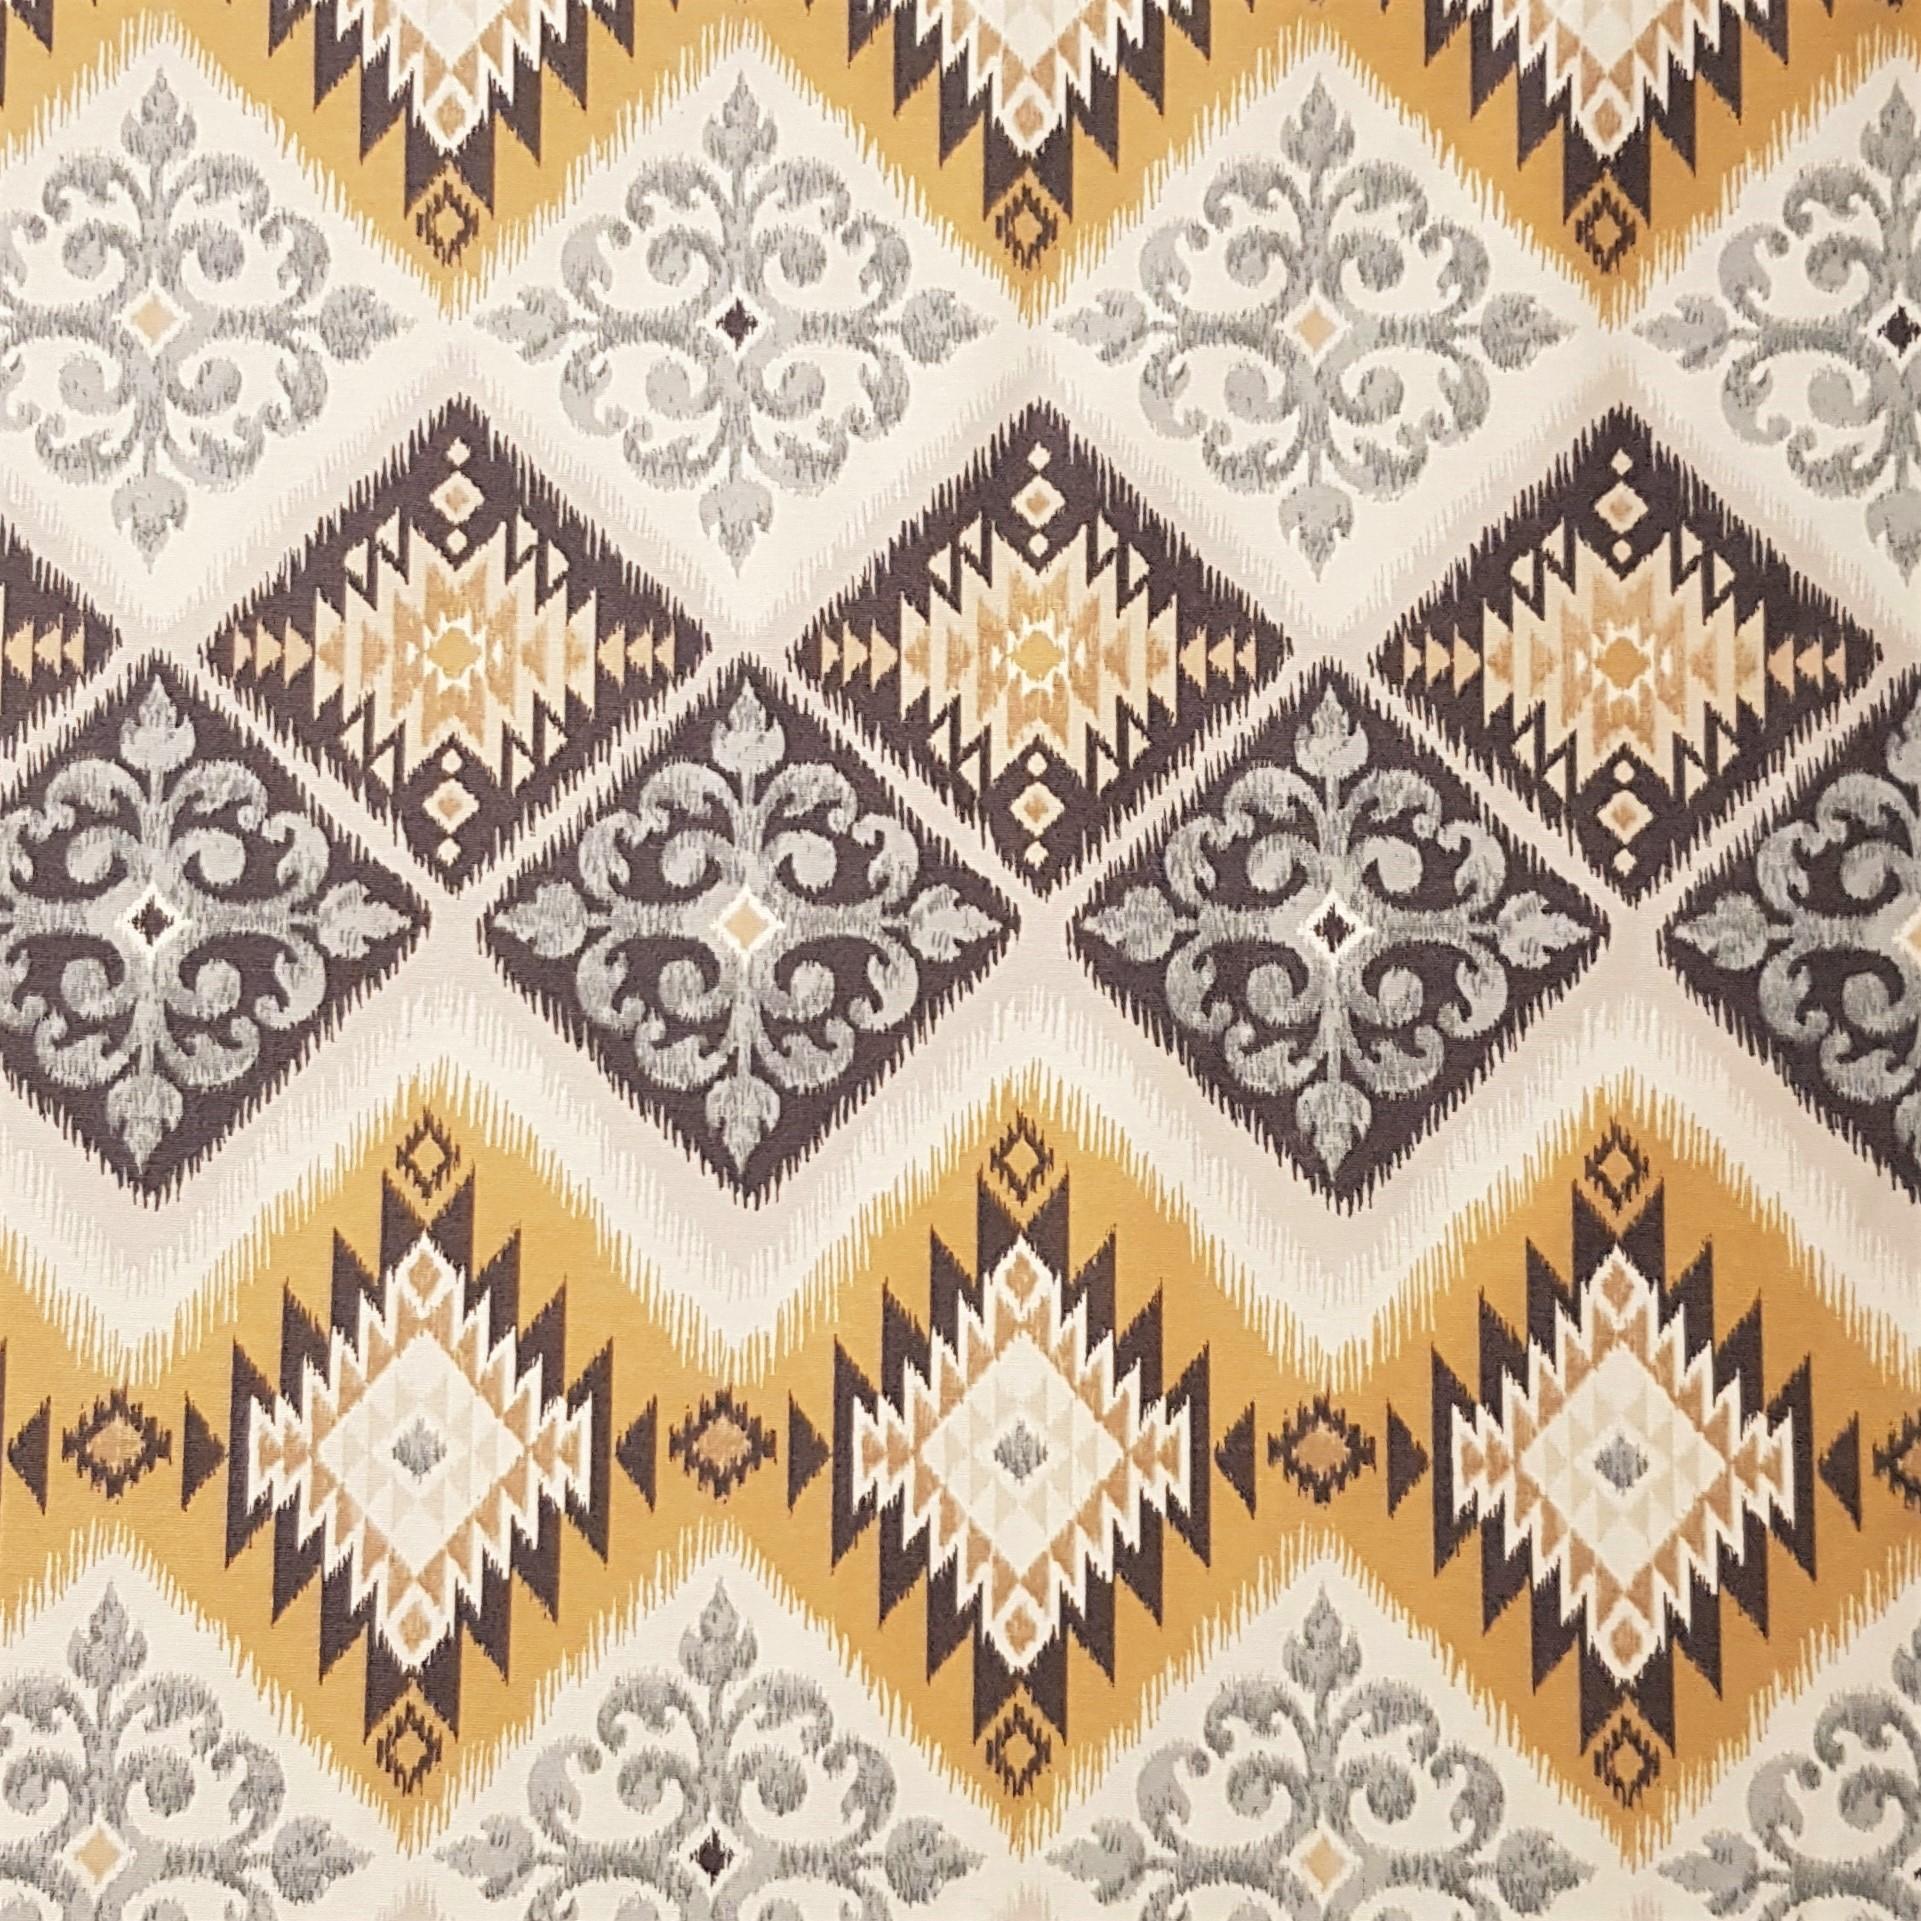 Mantel KILIMGRIS Rectangular 1,5x2,1 m [enstockpara envíooretiro]